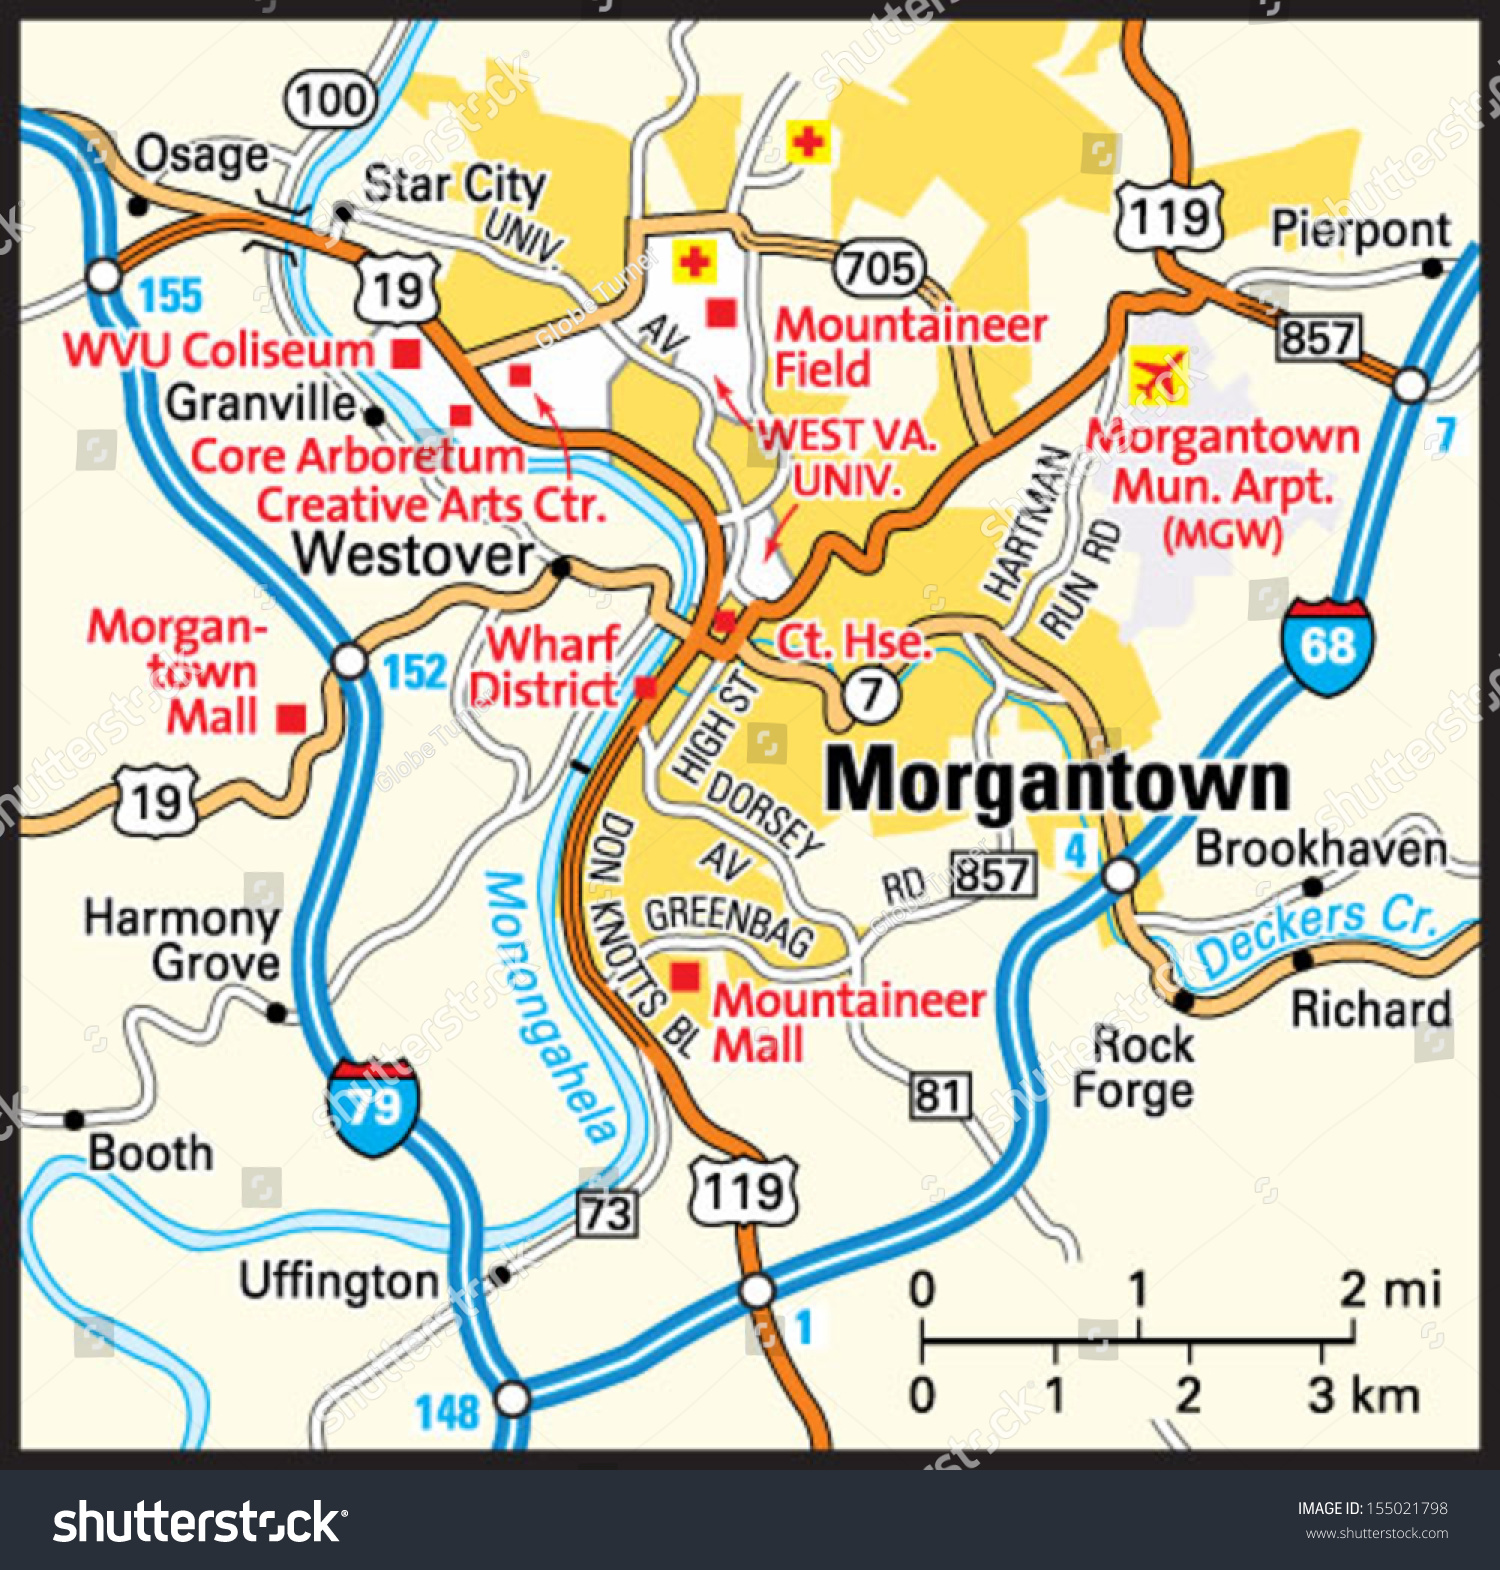 Morgantown West Virginia Area Map Stock Vector 155021798